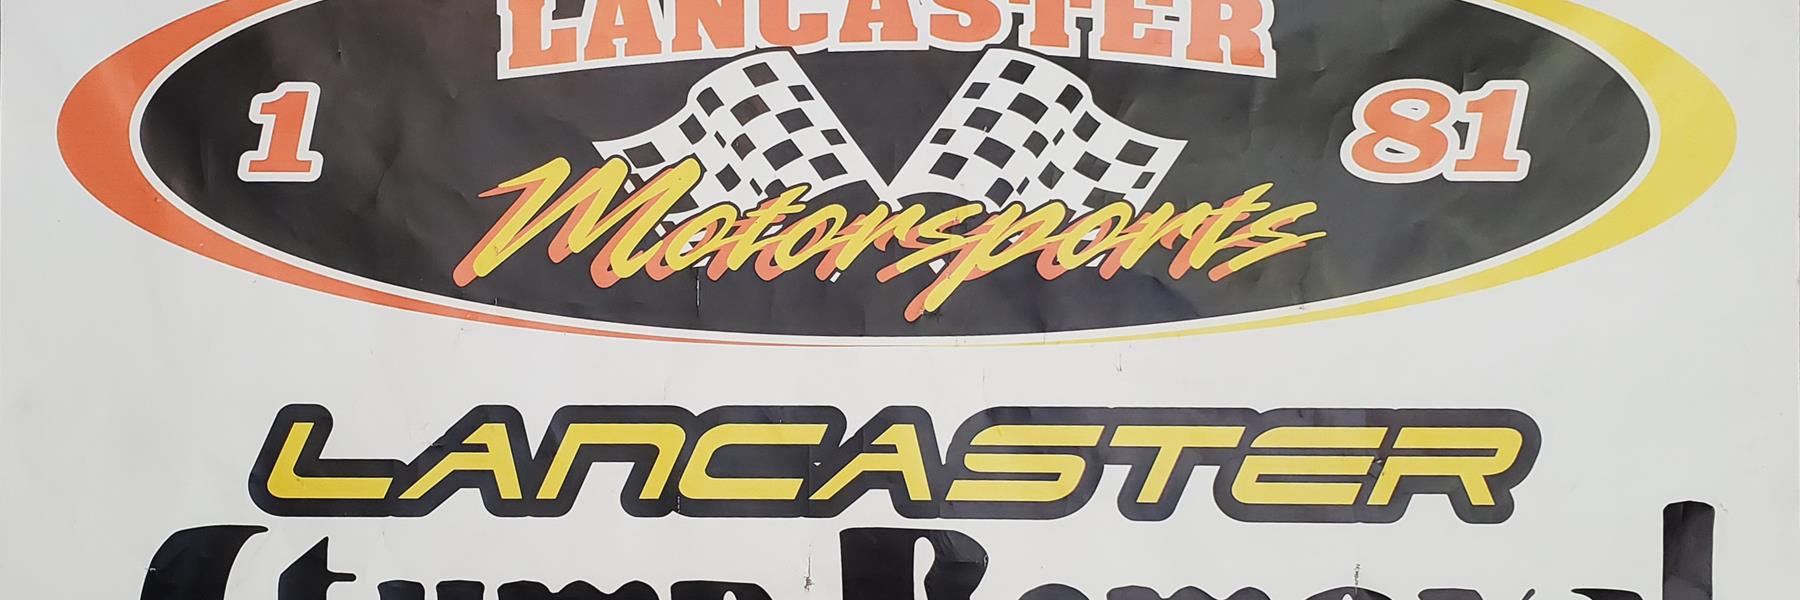 Bryan Lancaster